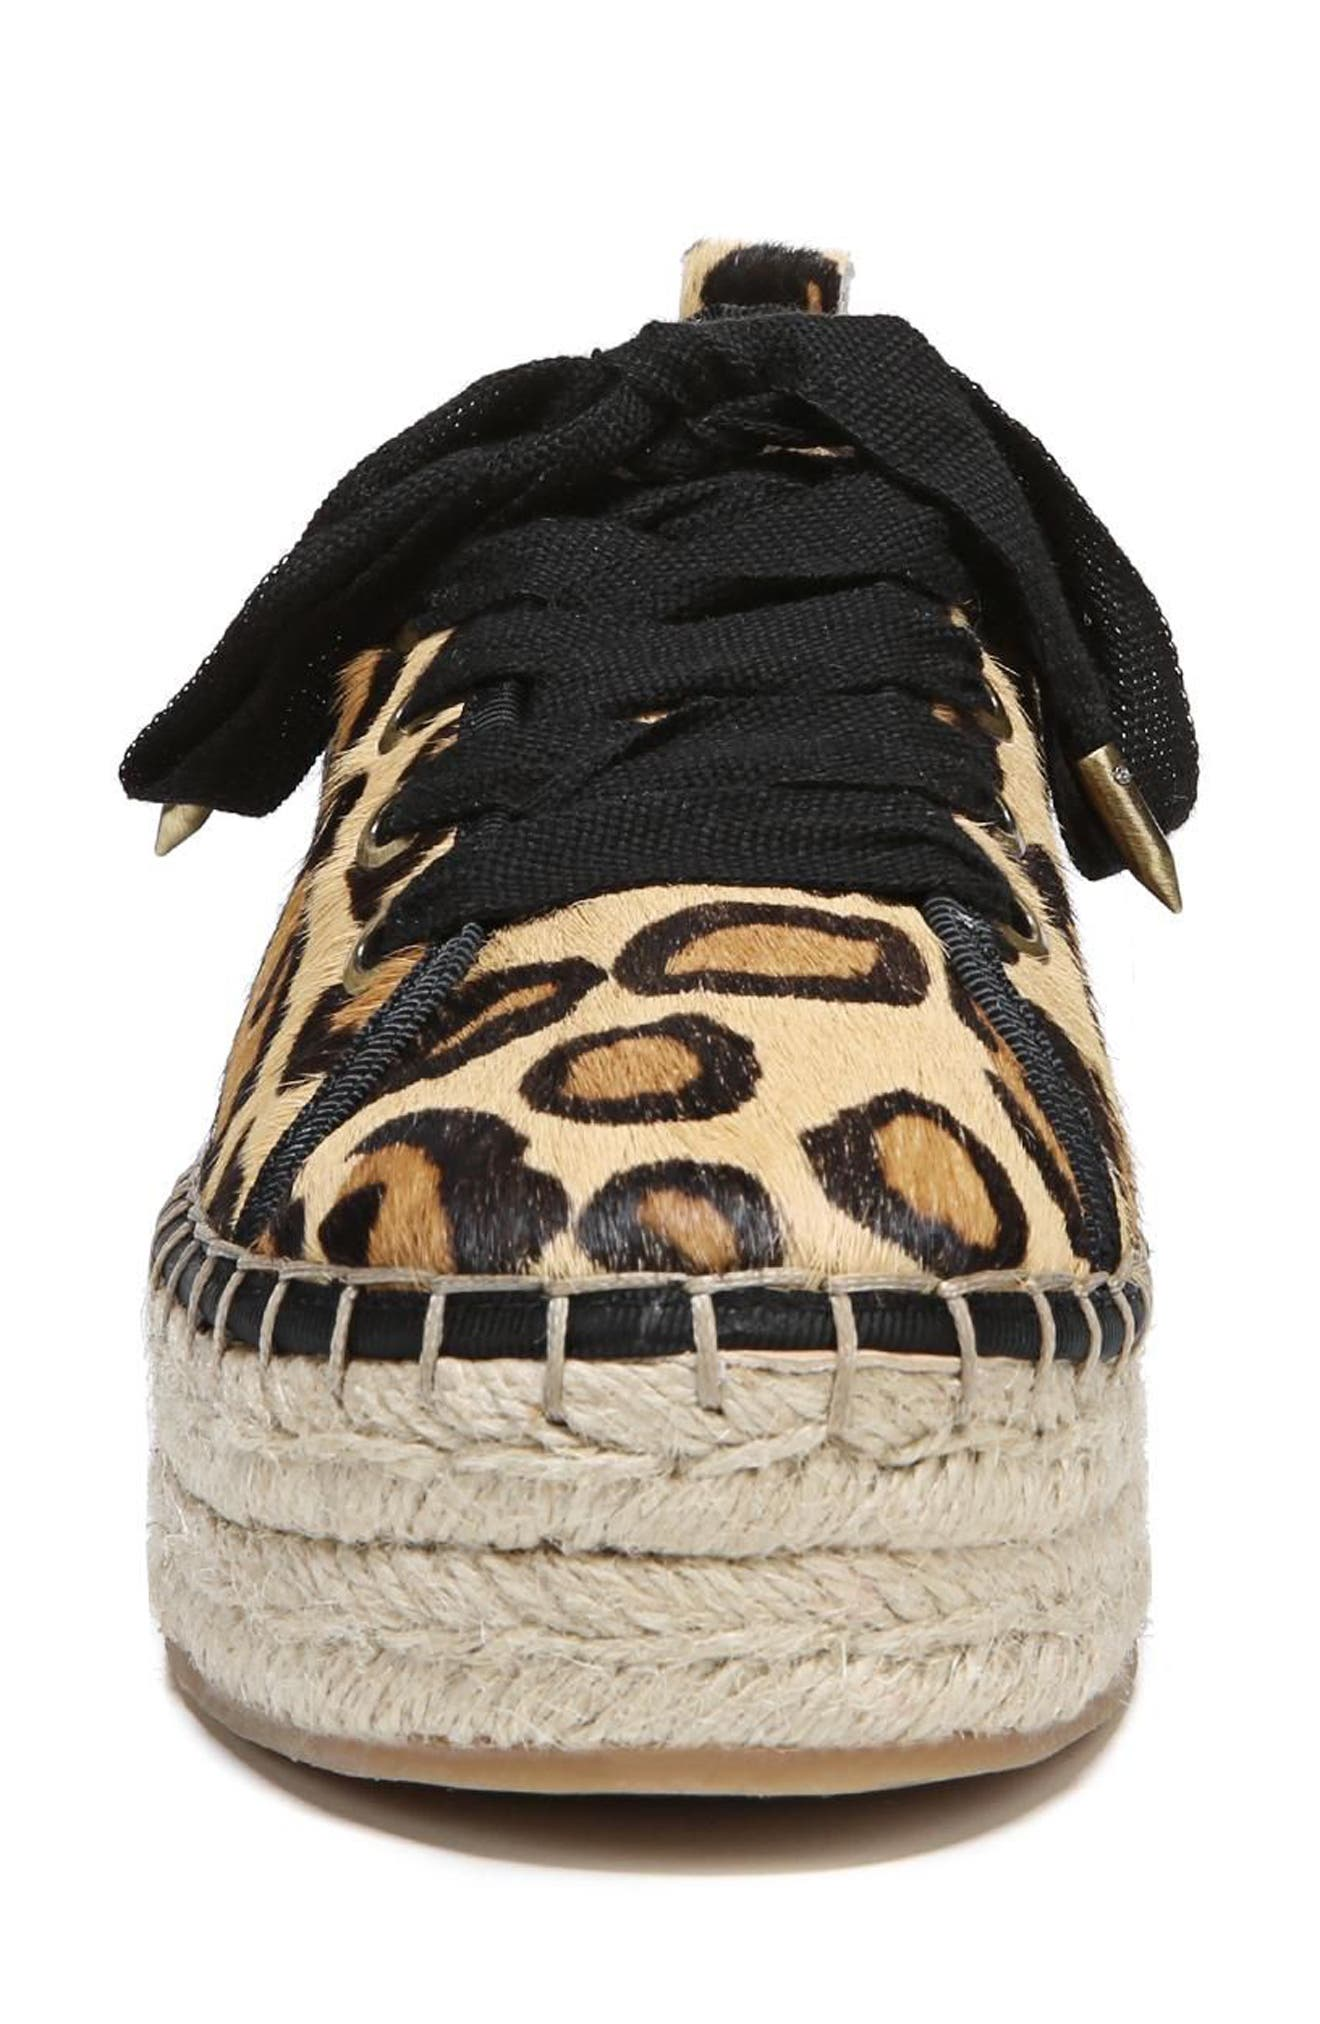 Celina Genuine Calf Hair Espadrille Flat,                             Alternate thumbnail 4, color,                             New Nude Leopard Brahma Hair